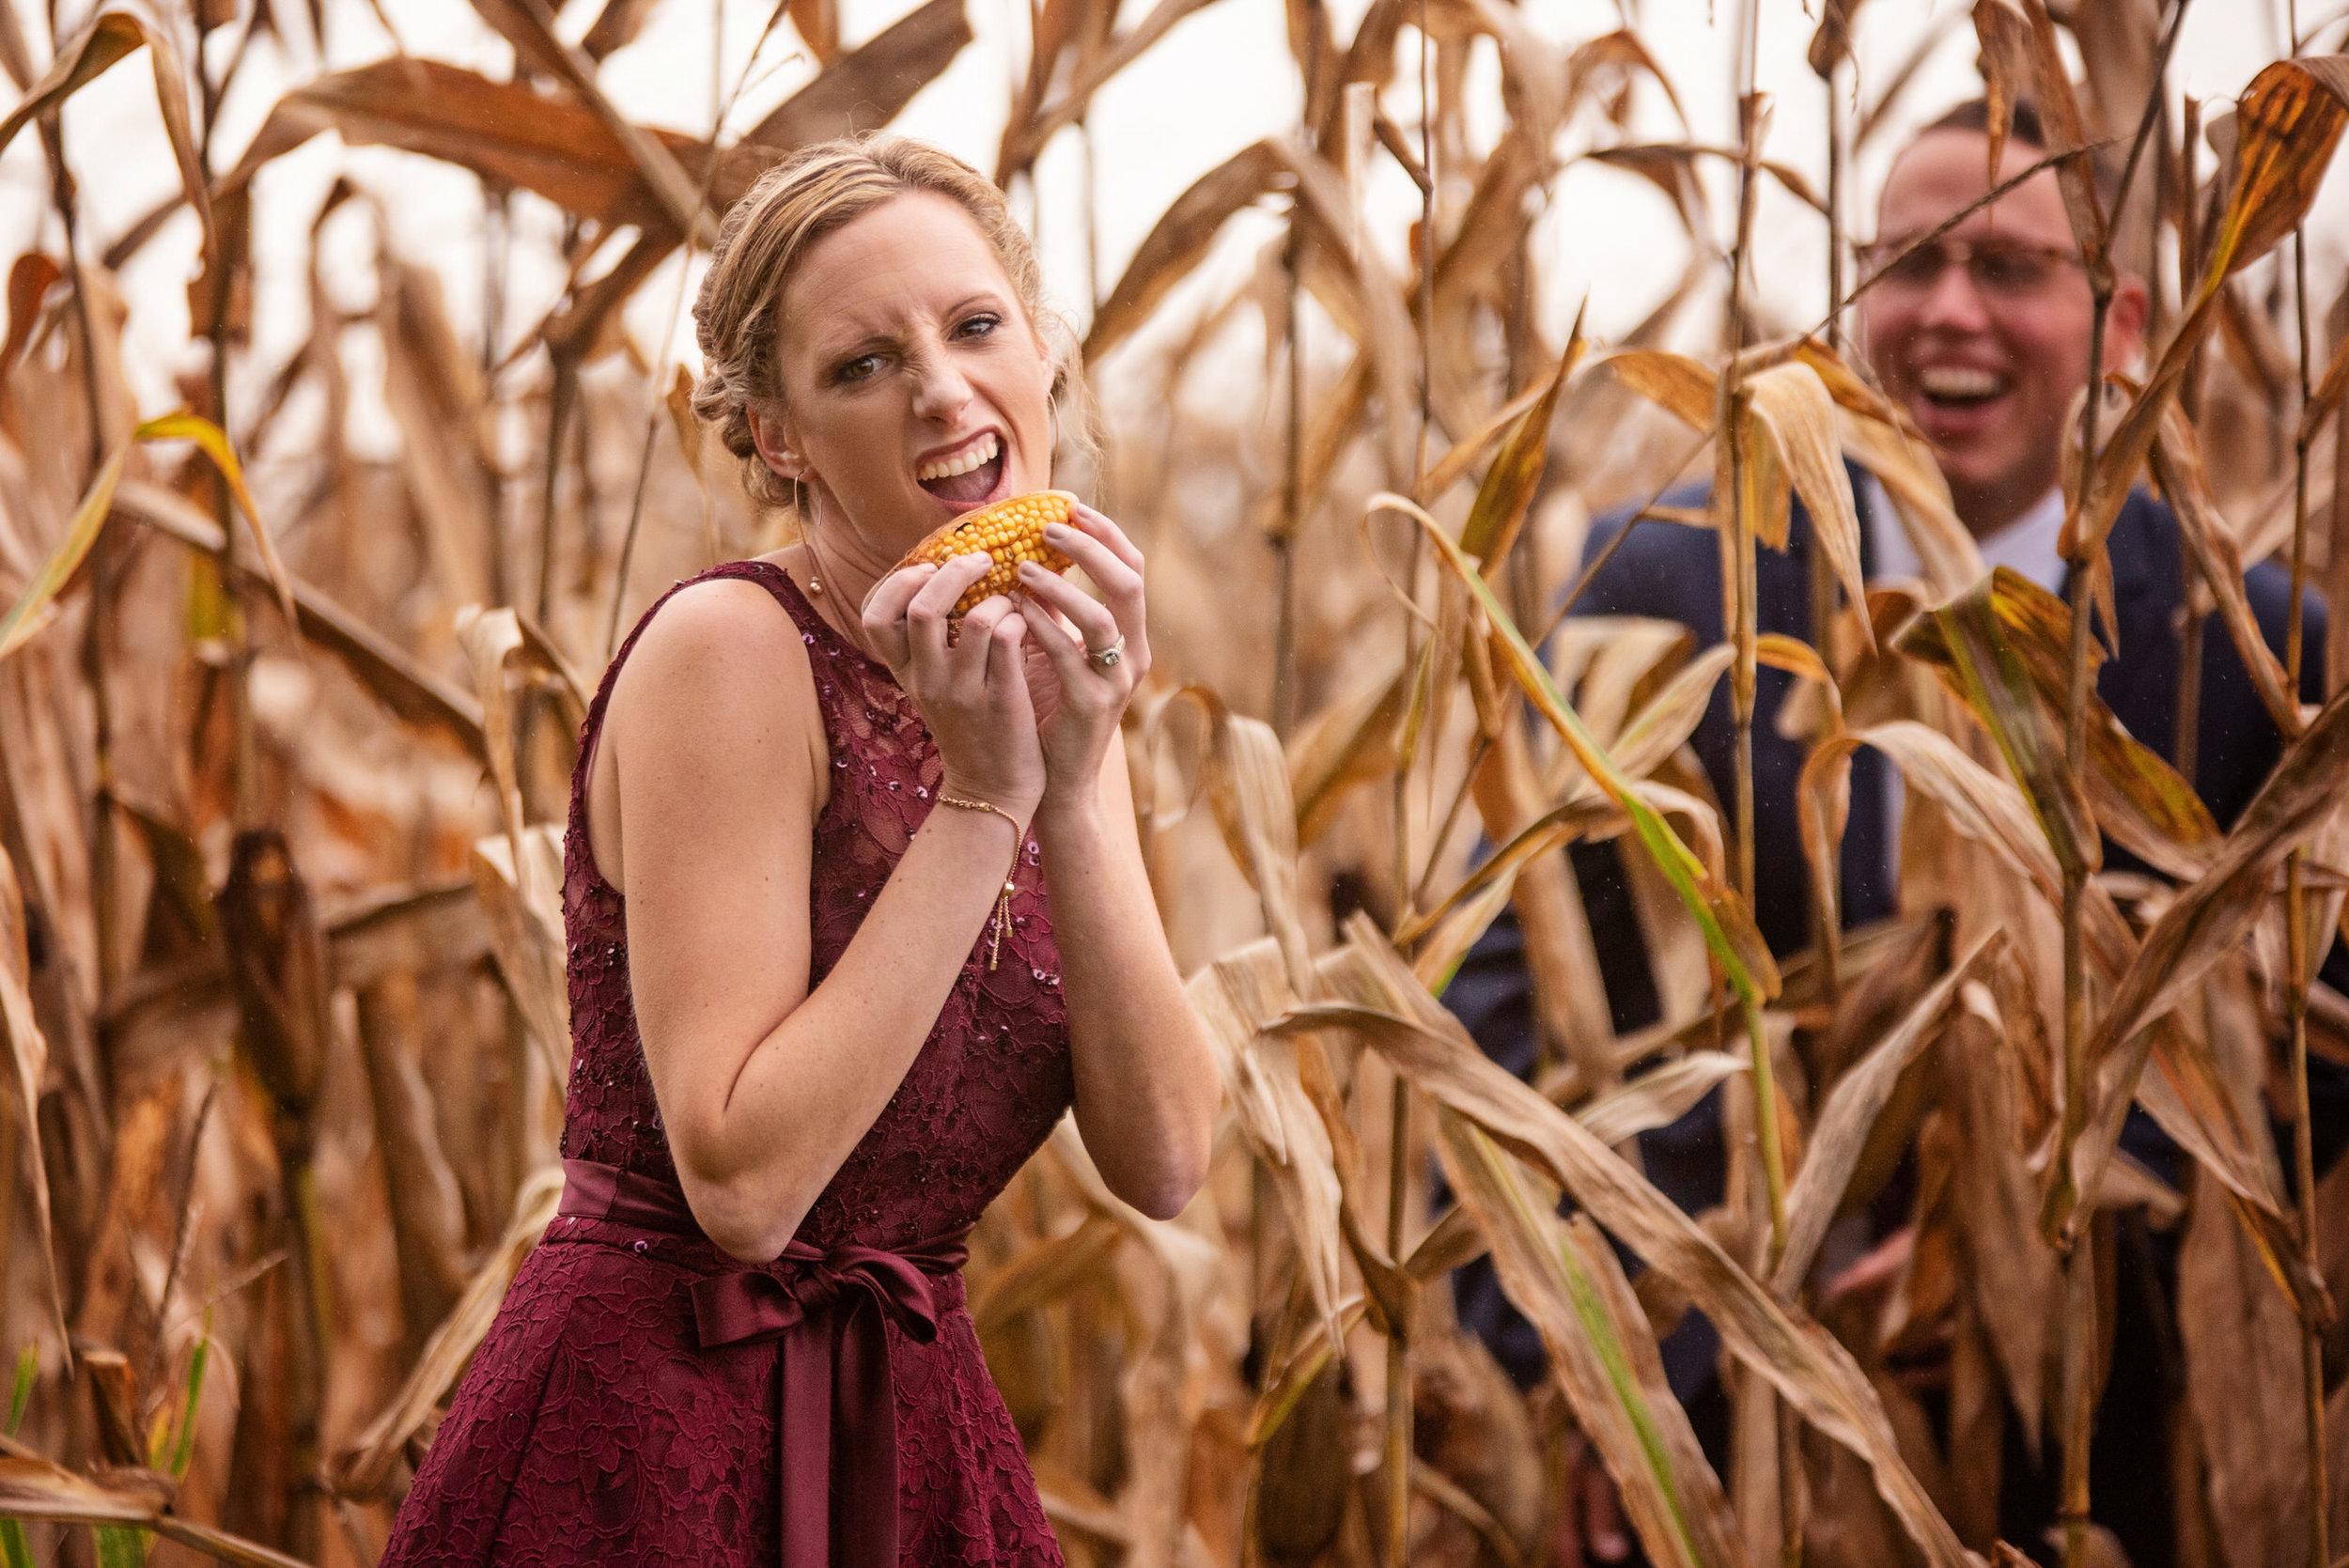 WalkersOverlookWedding-Angela&Ben-WeddingParty-40.jpg